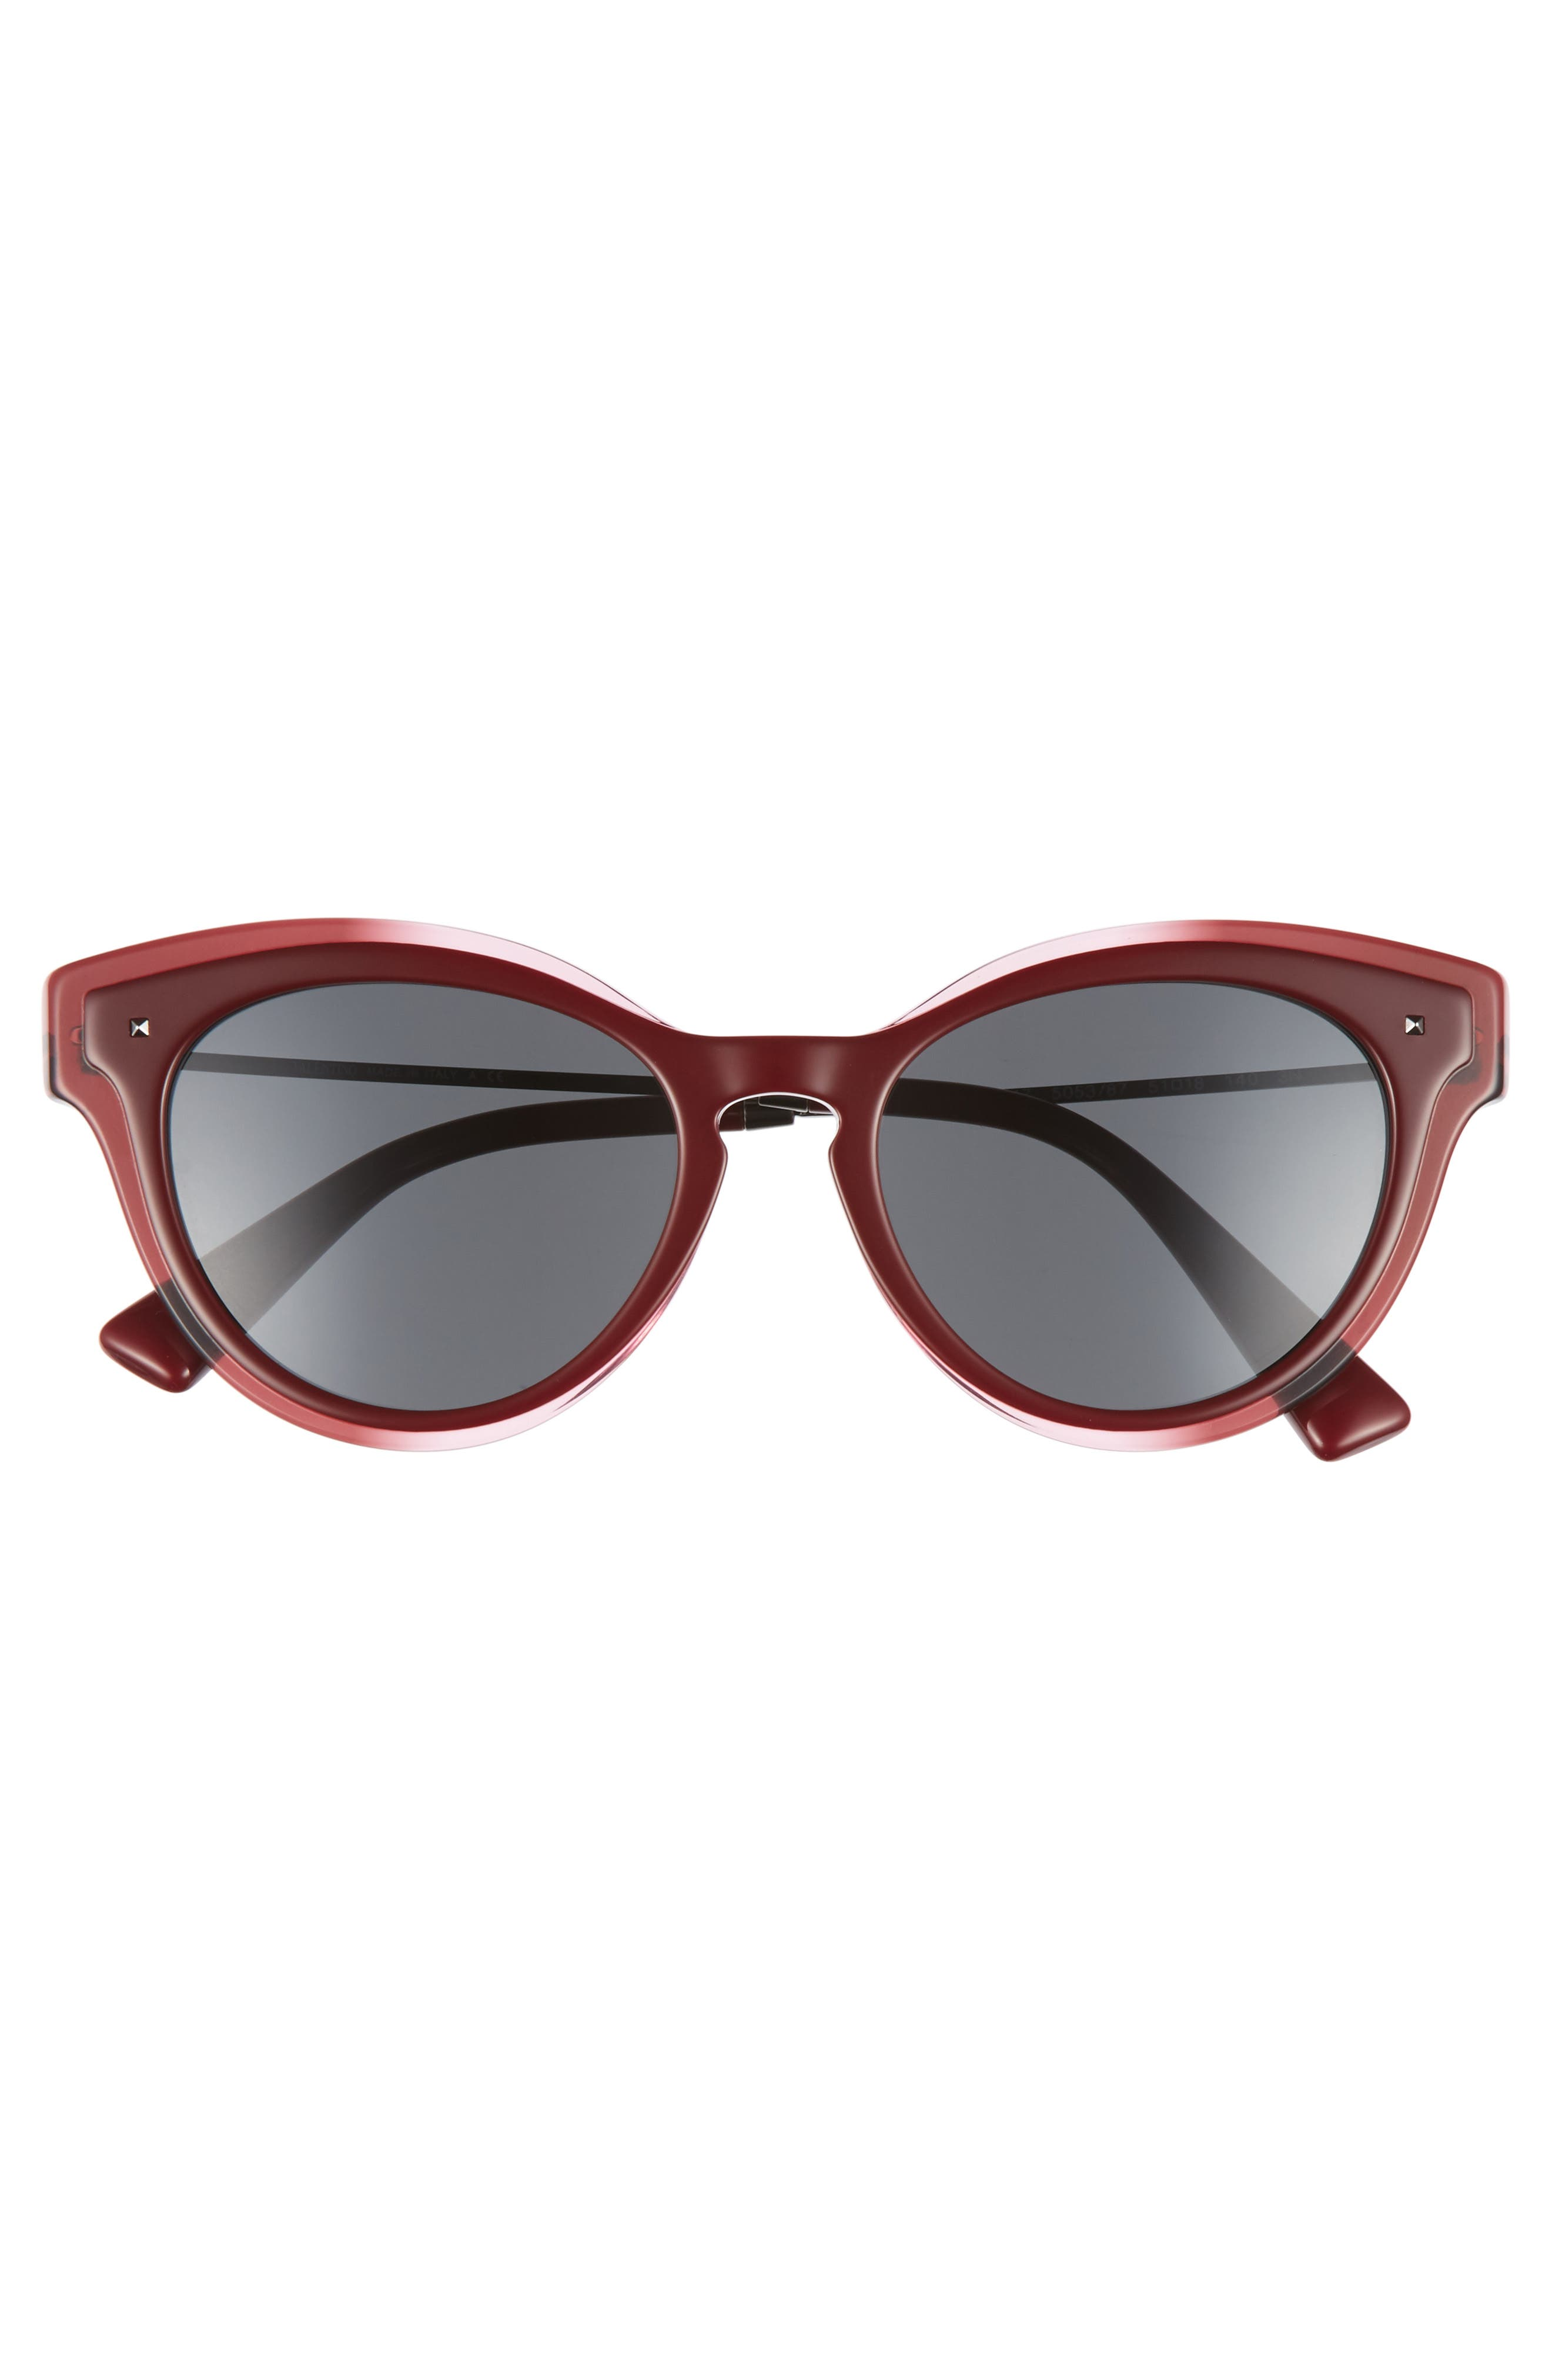 51mm Cat Eye Sunglasses,                             Alternate thumbnail 3, color,                             600